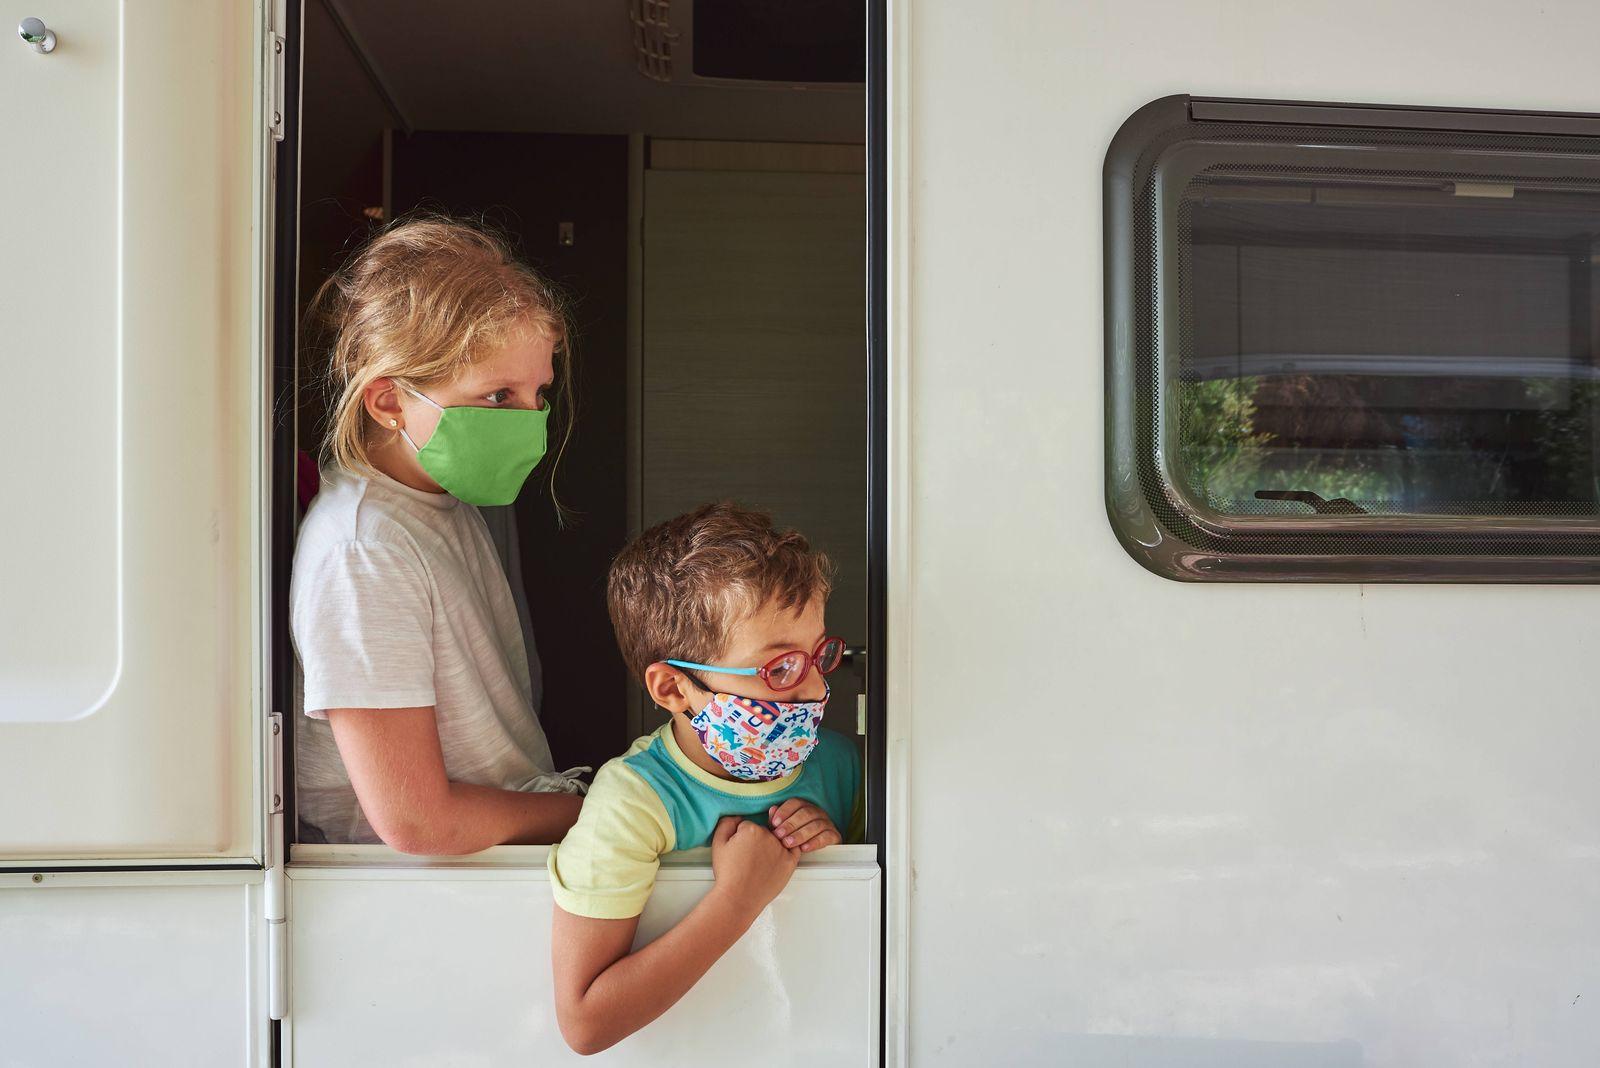 Brothers on vacation in a caravan. CÛrdoba, AL, Spain PUBLICATIONxINxGERxSUIxAUTxONLY CR_FPOBYG200813-468882-01 ,model r